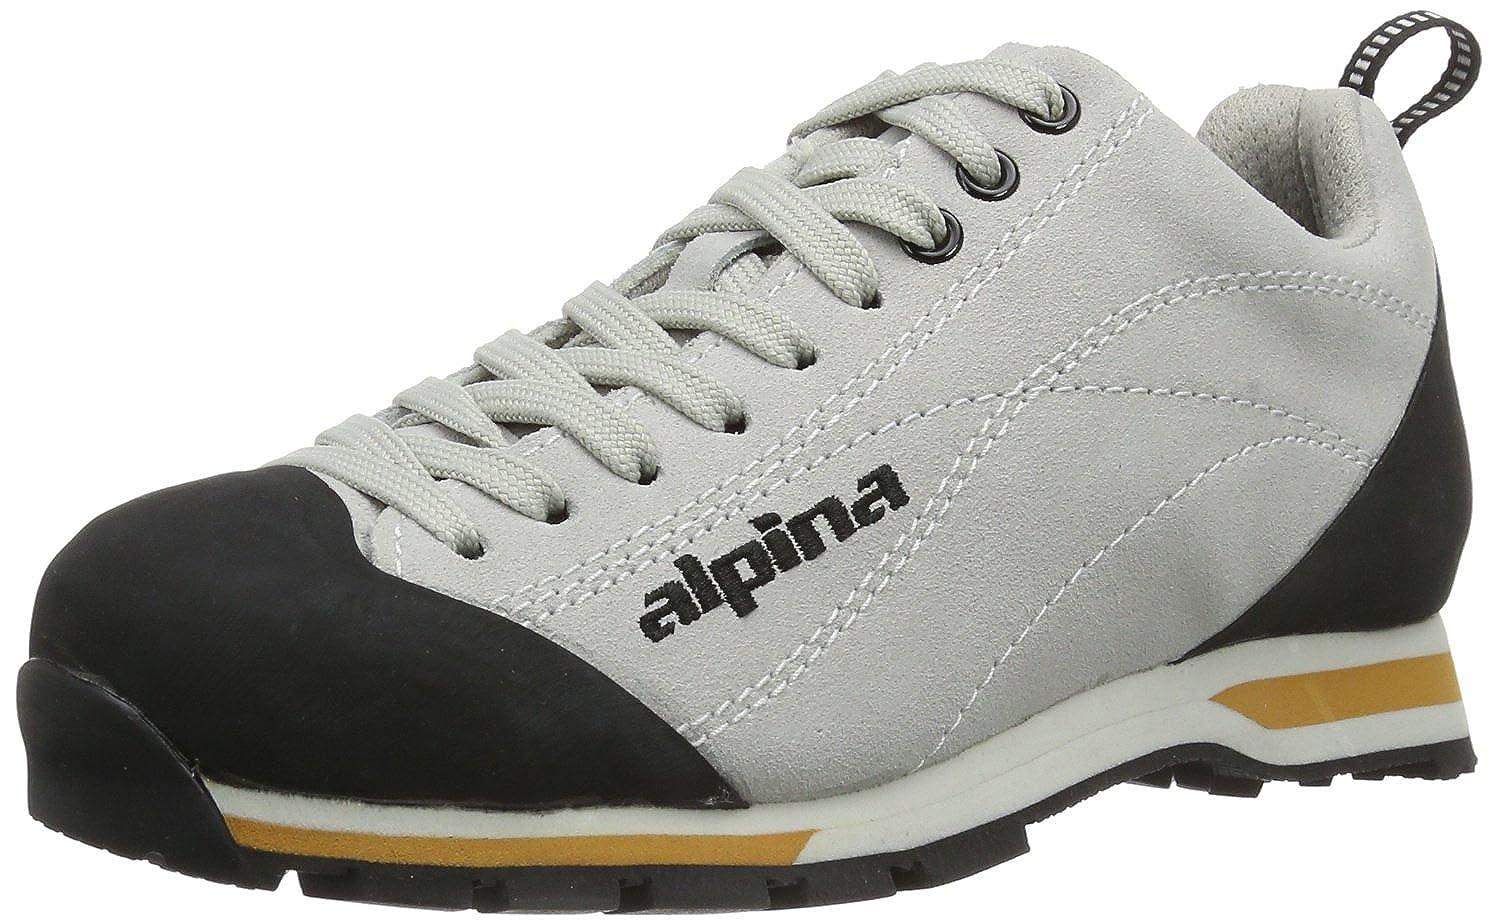 Alpina 680271 Unisex-Erwachsene Trekking- & Wanderschuhe